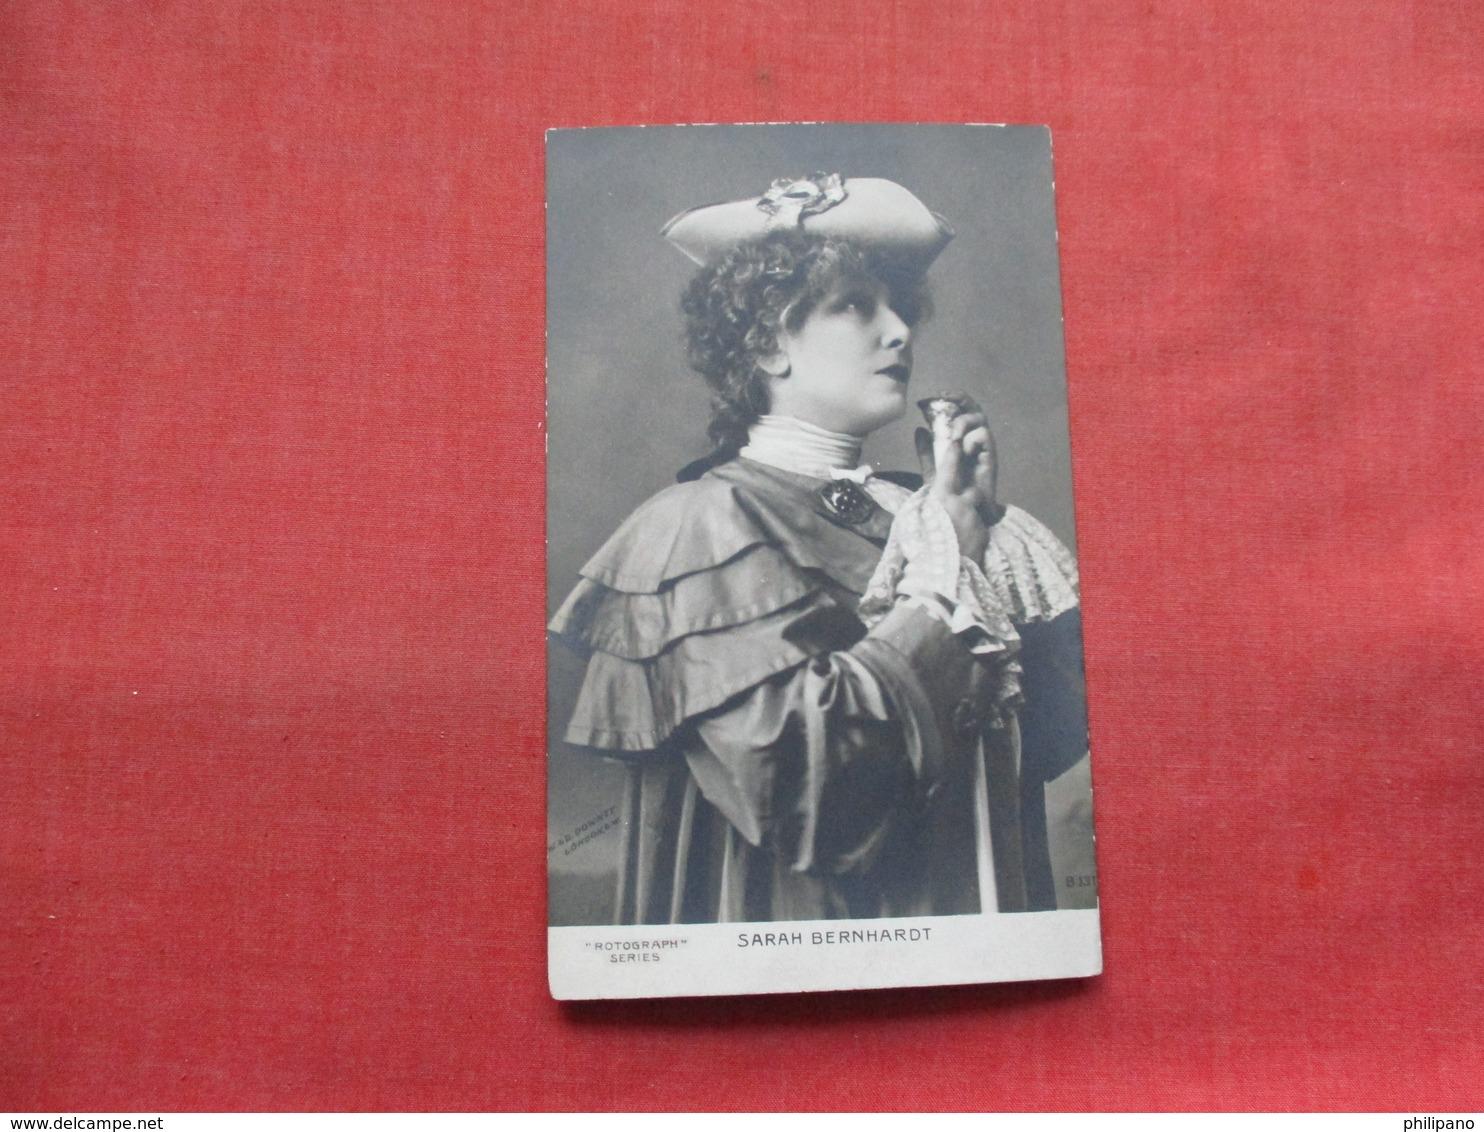 Rotograph Series  Sarah Bernhardt     Ref 3347 - Famous Ladies